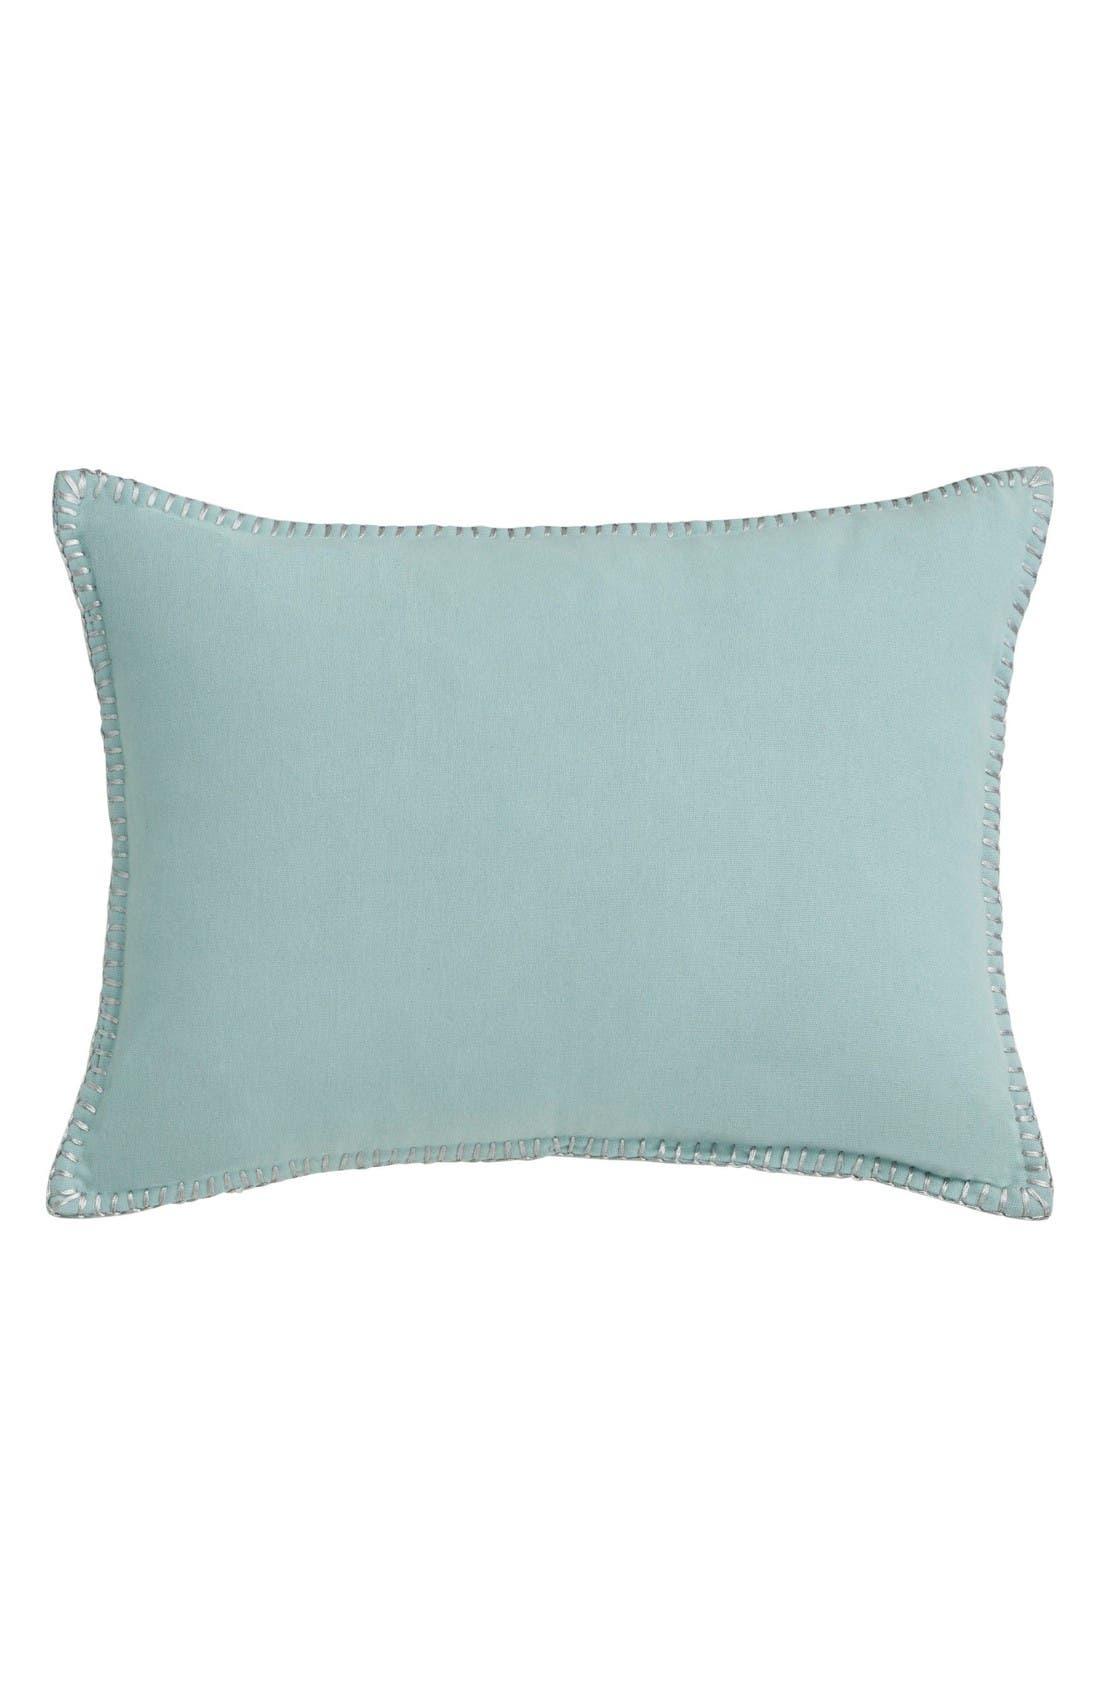 Main Image - Jill Rosenwald Capri Stripe Accent Pillow